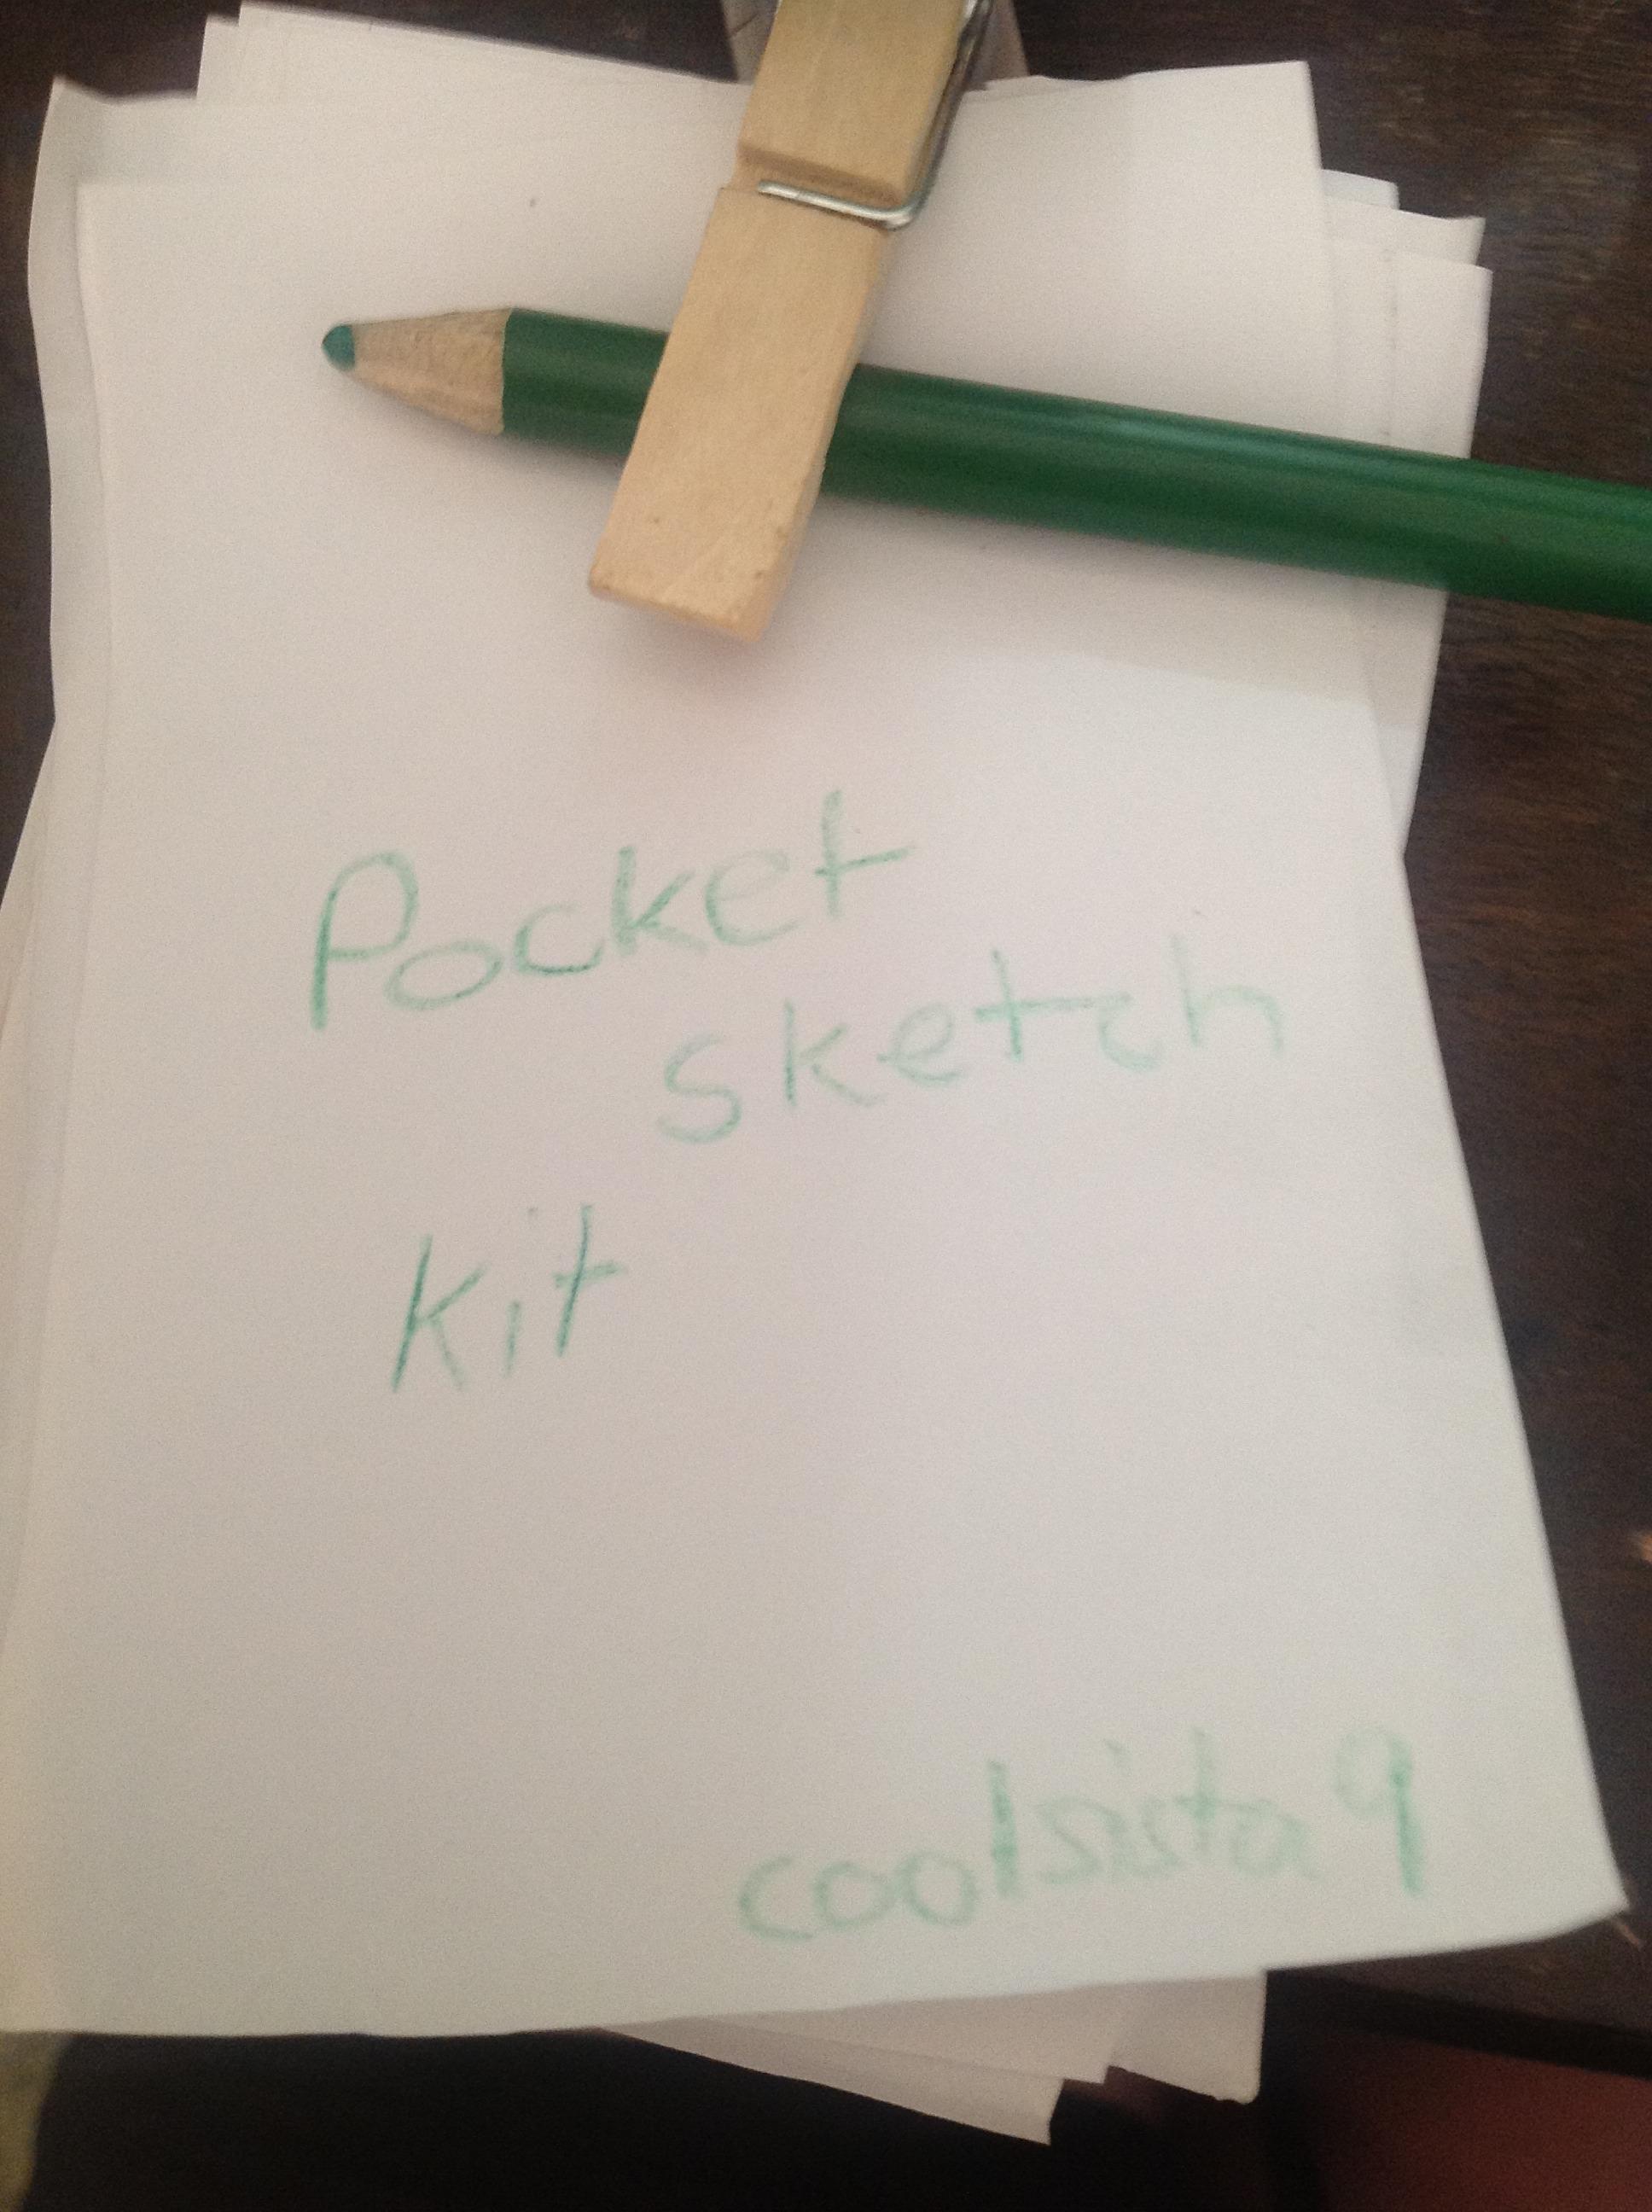 How To Make A Pocket Sketch Kit